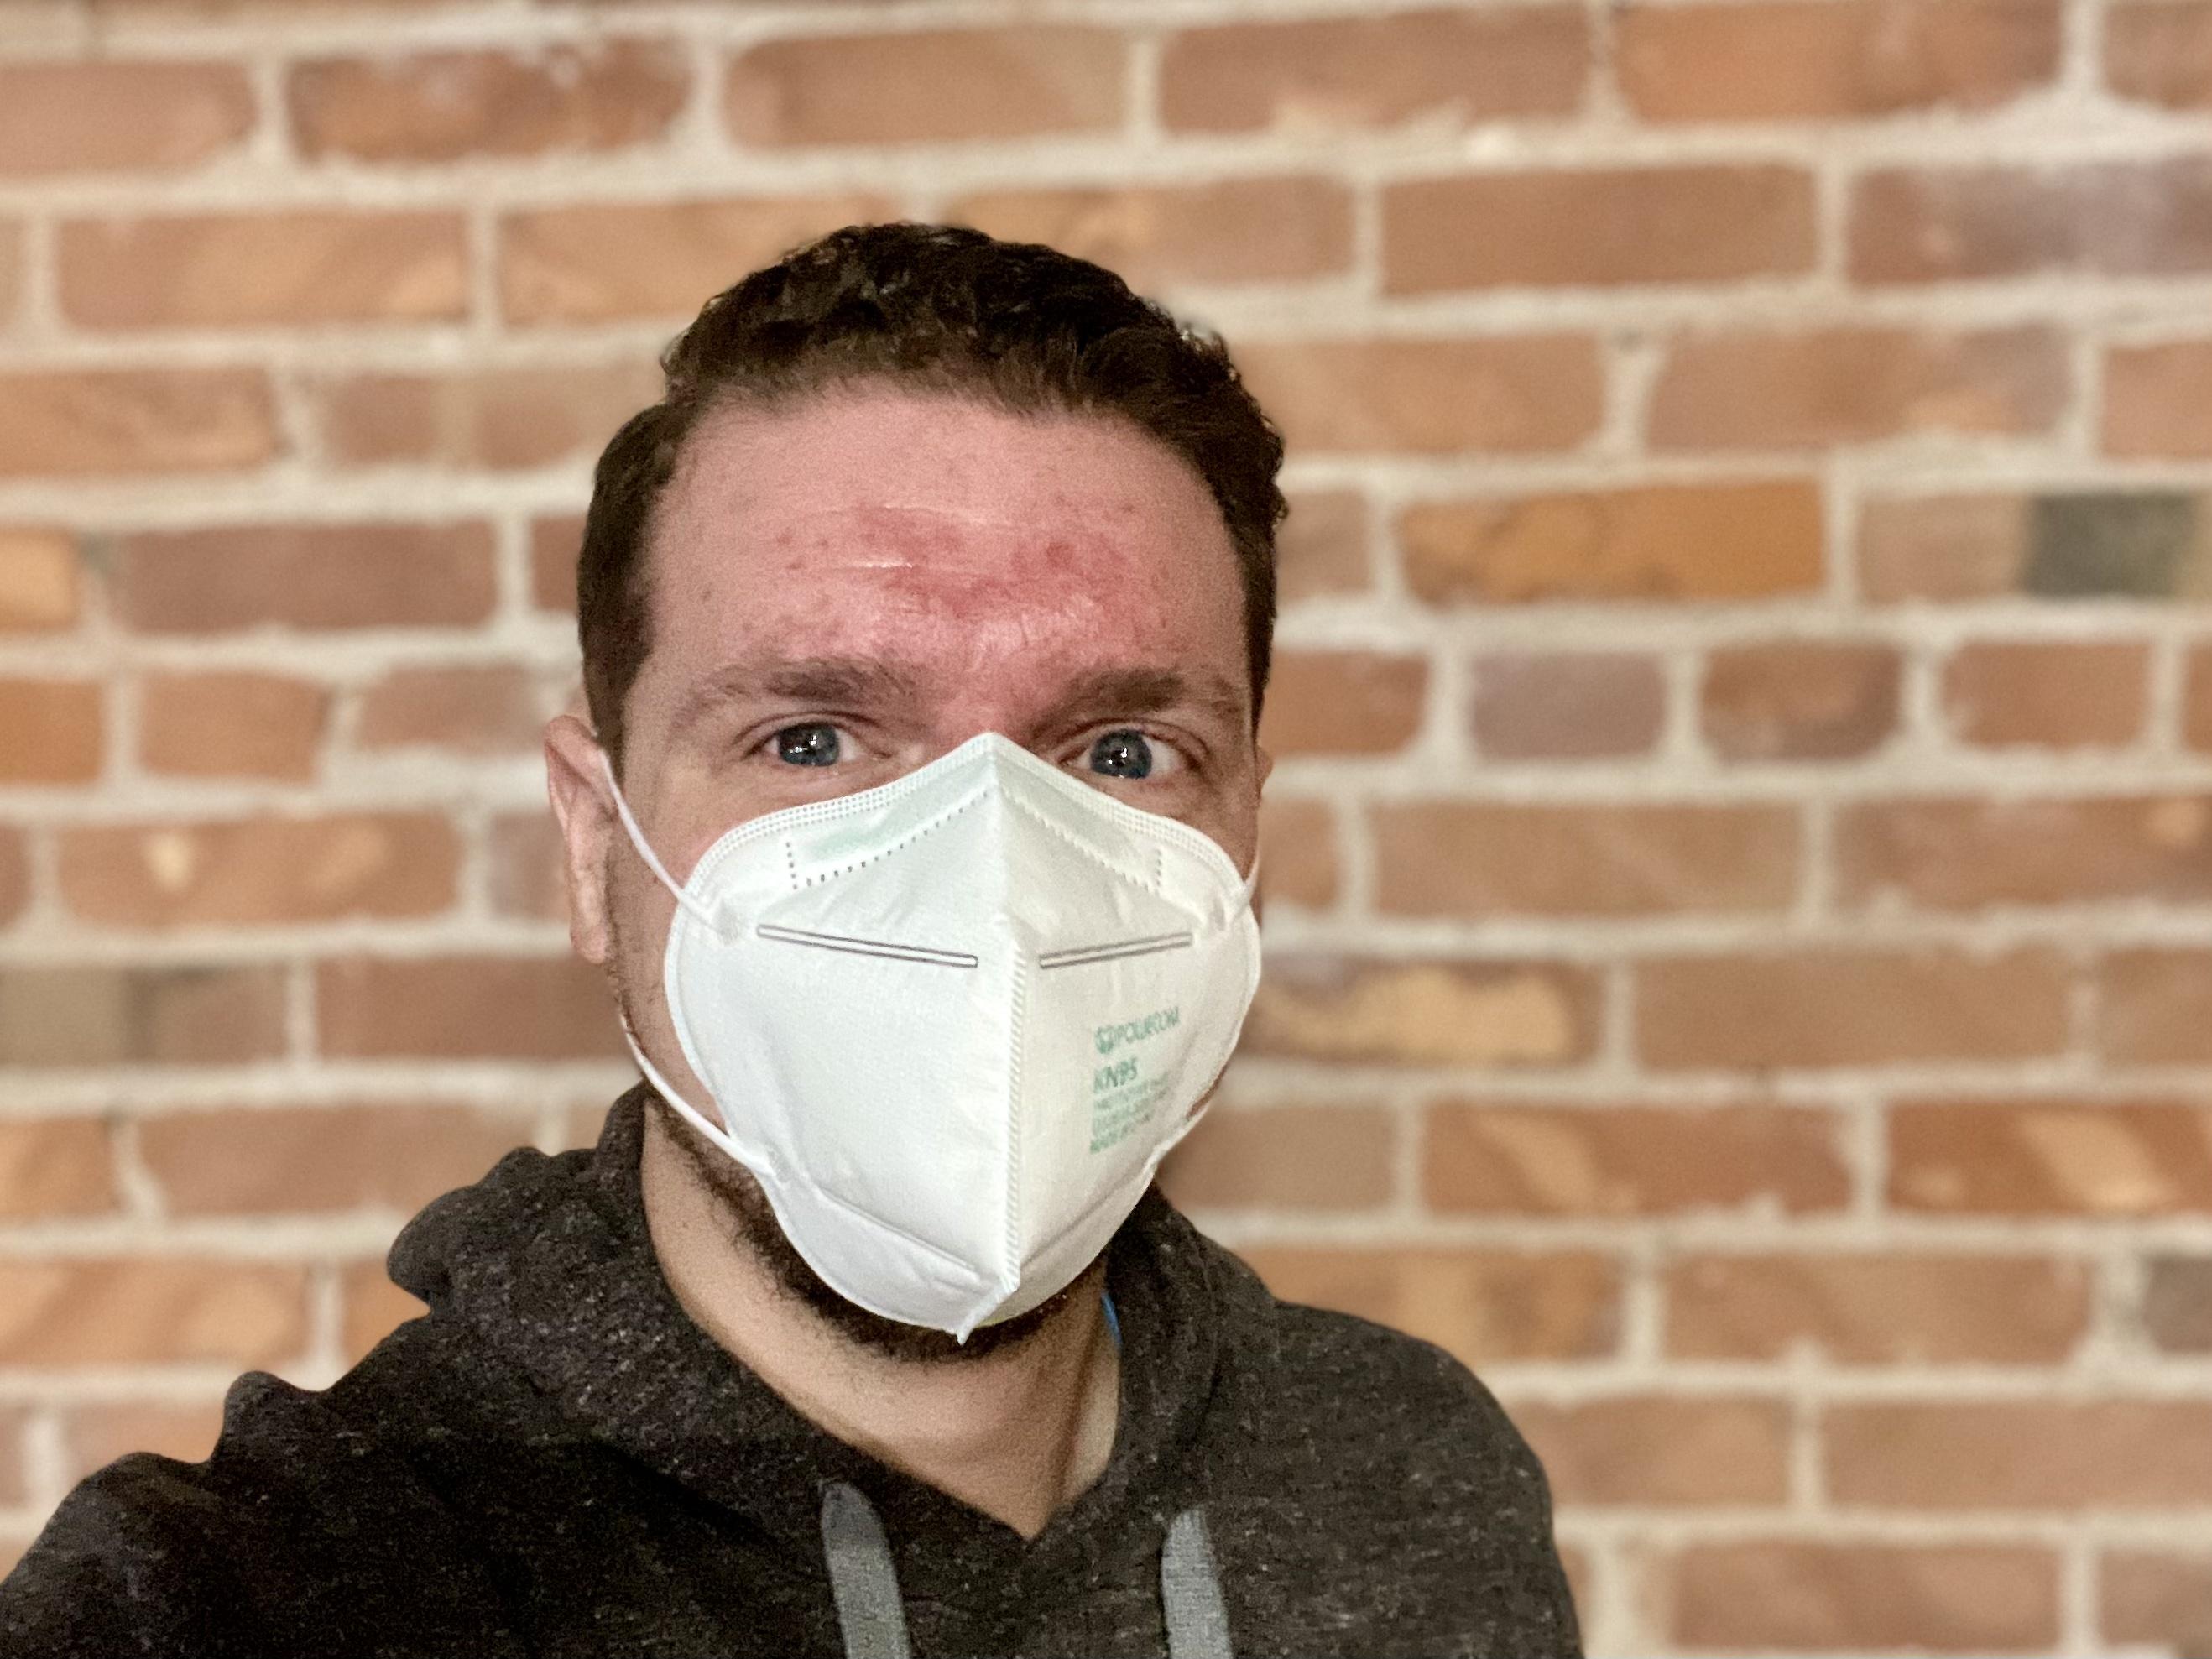 Man wearing KN95 mask